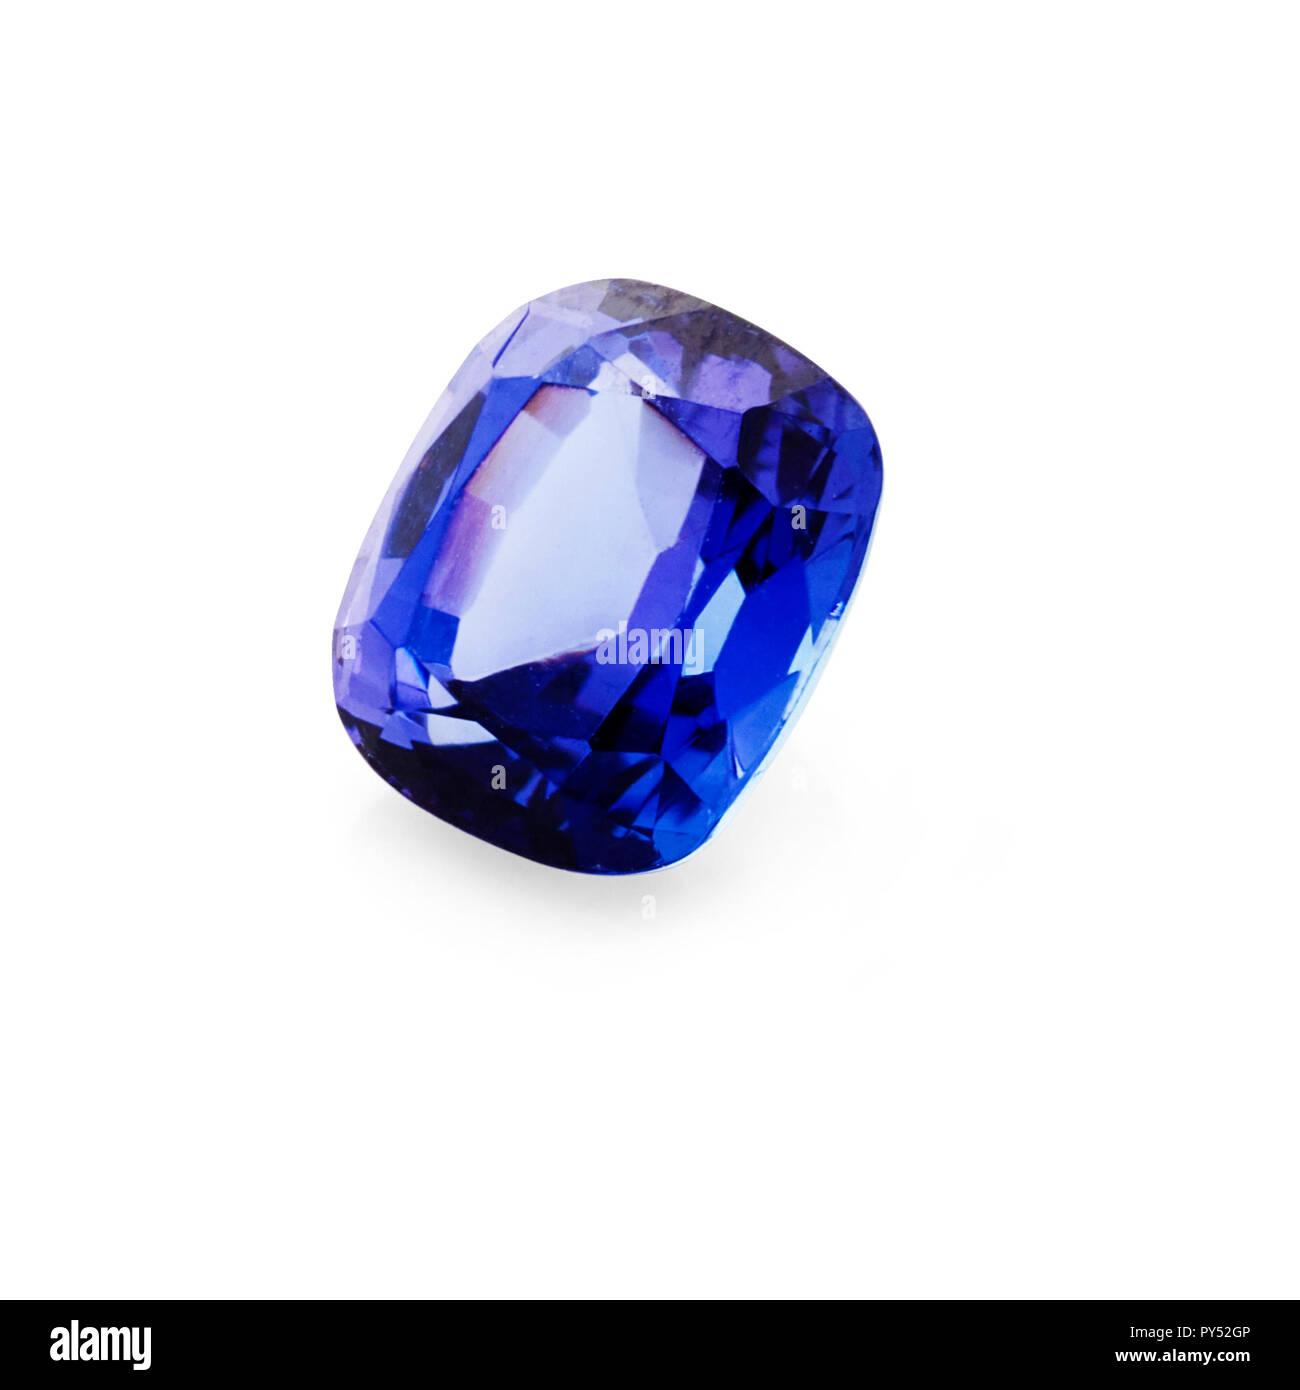 1.40 carat, tanzanite cushion gemstone on a white background - Stock Image